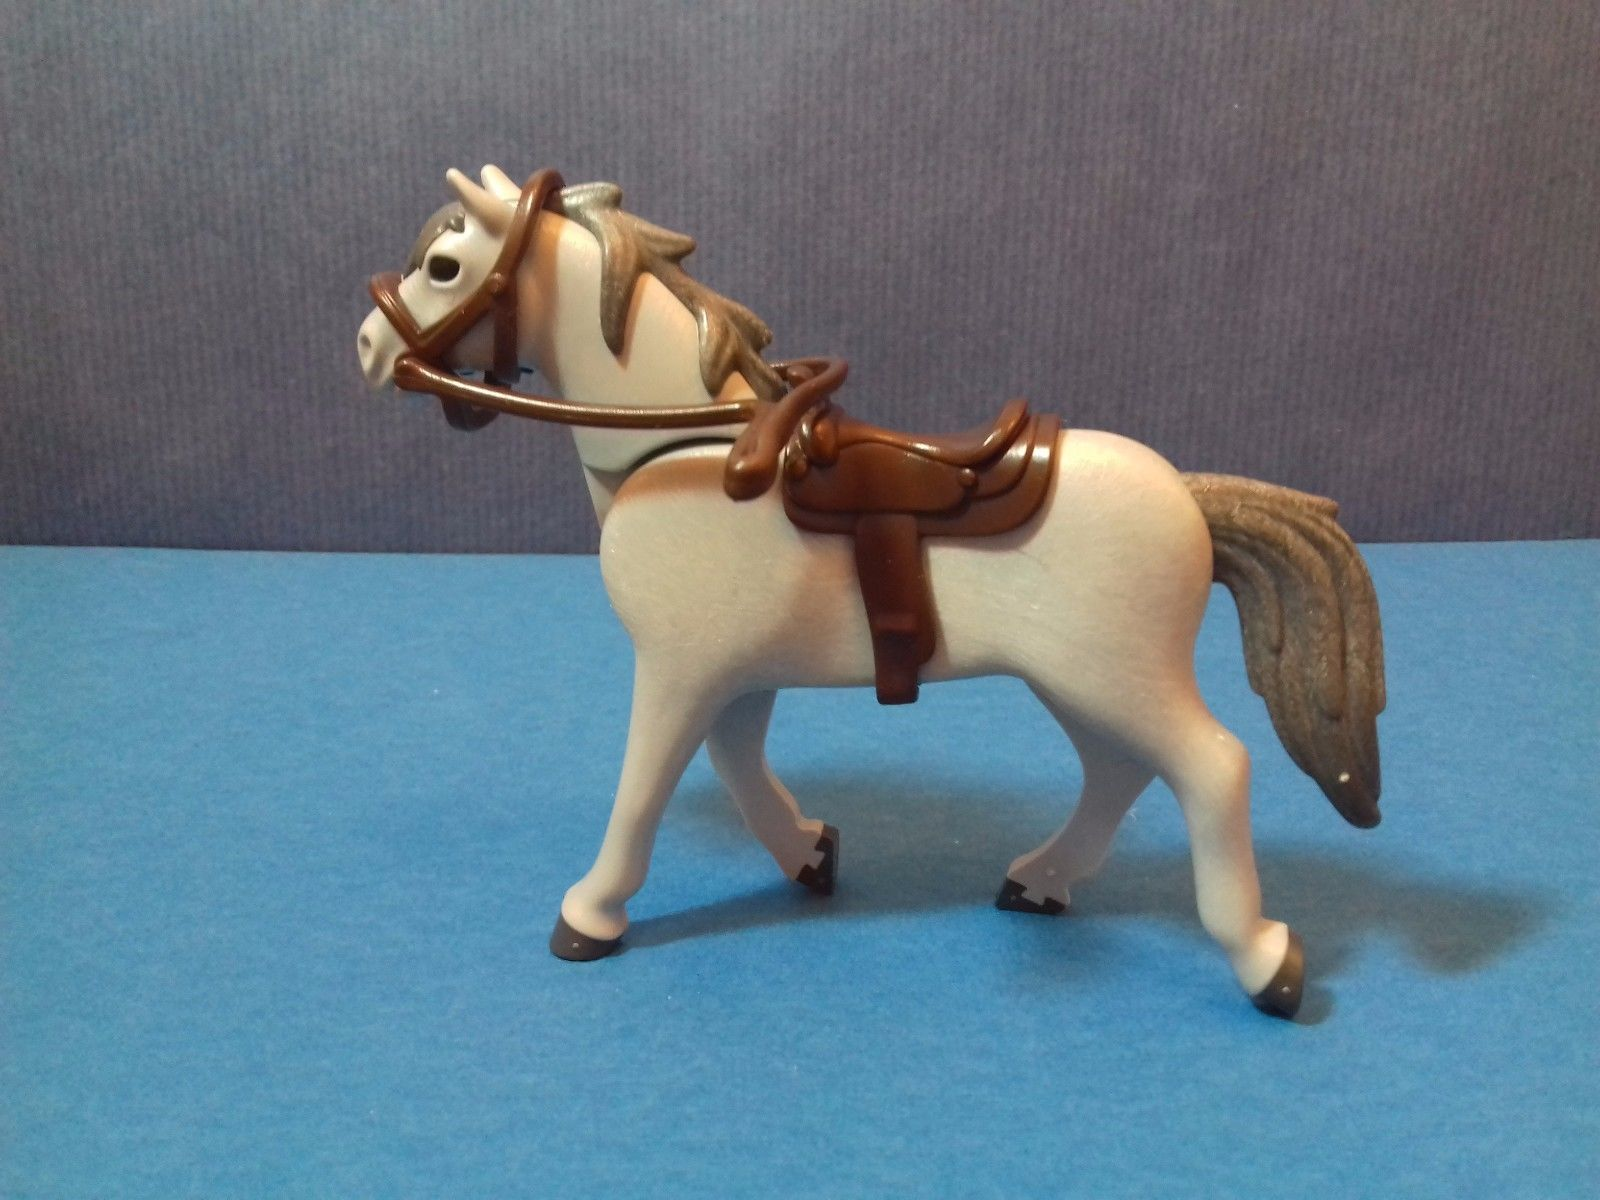 Playmobil cheval gris